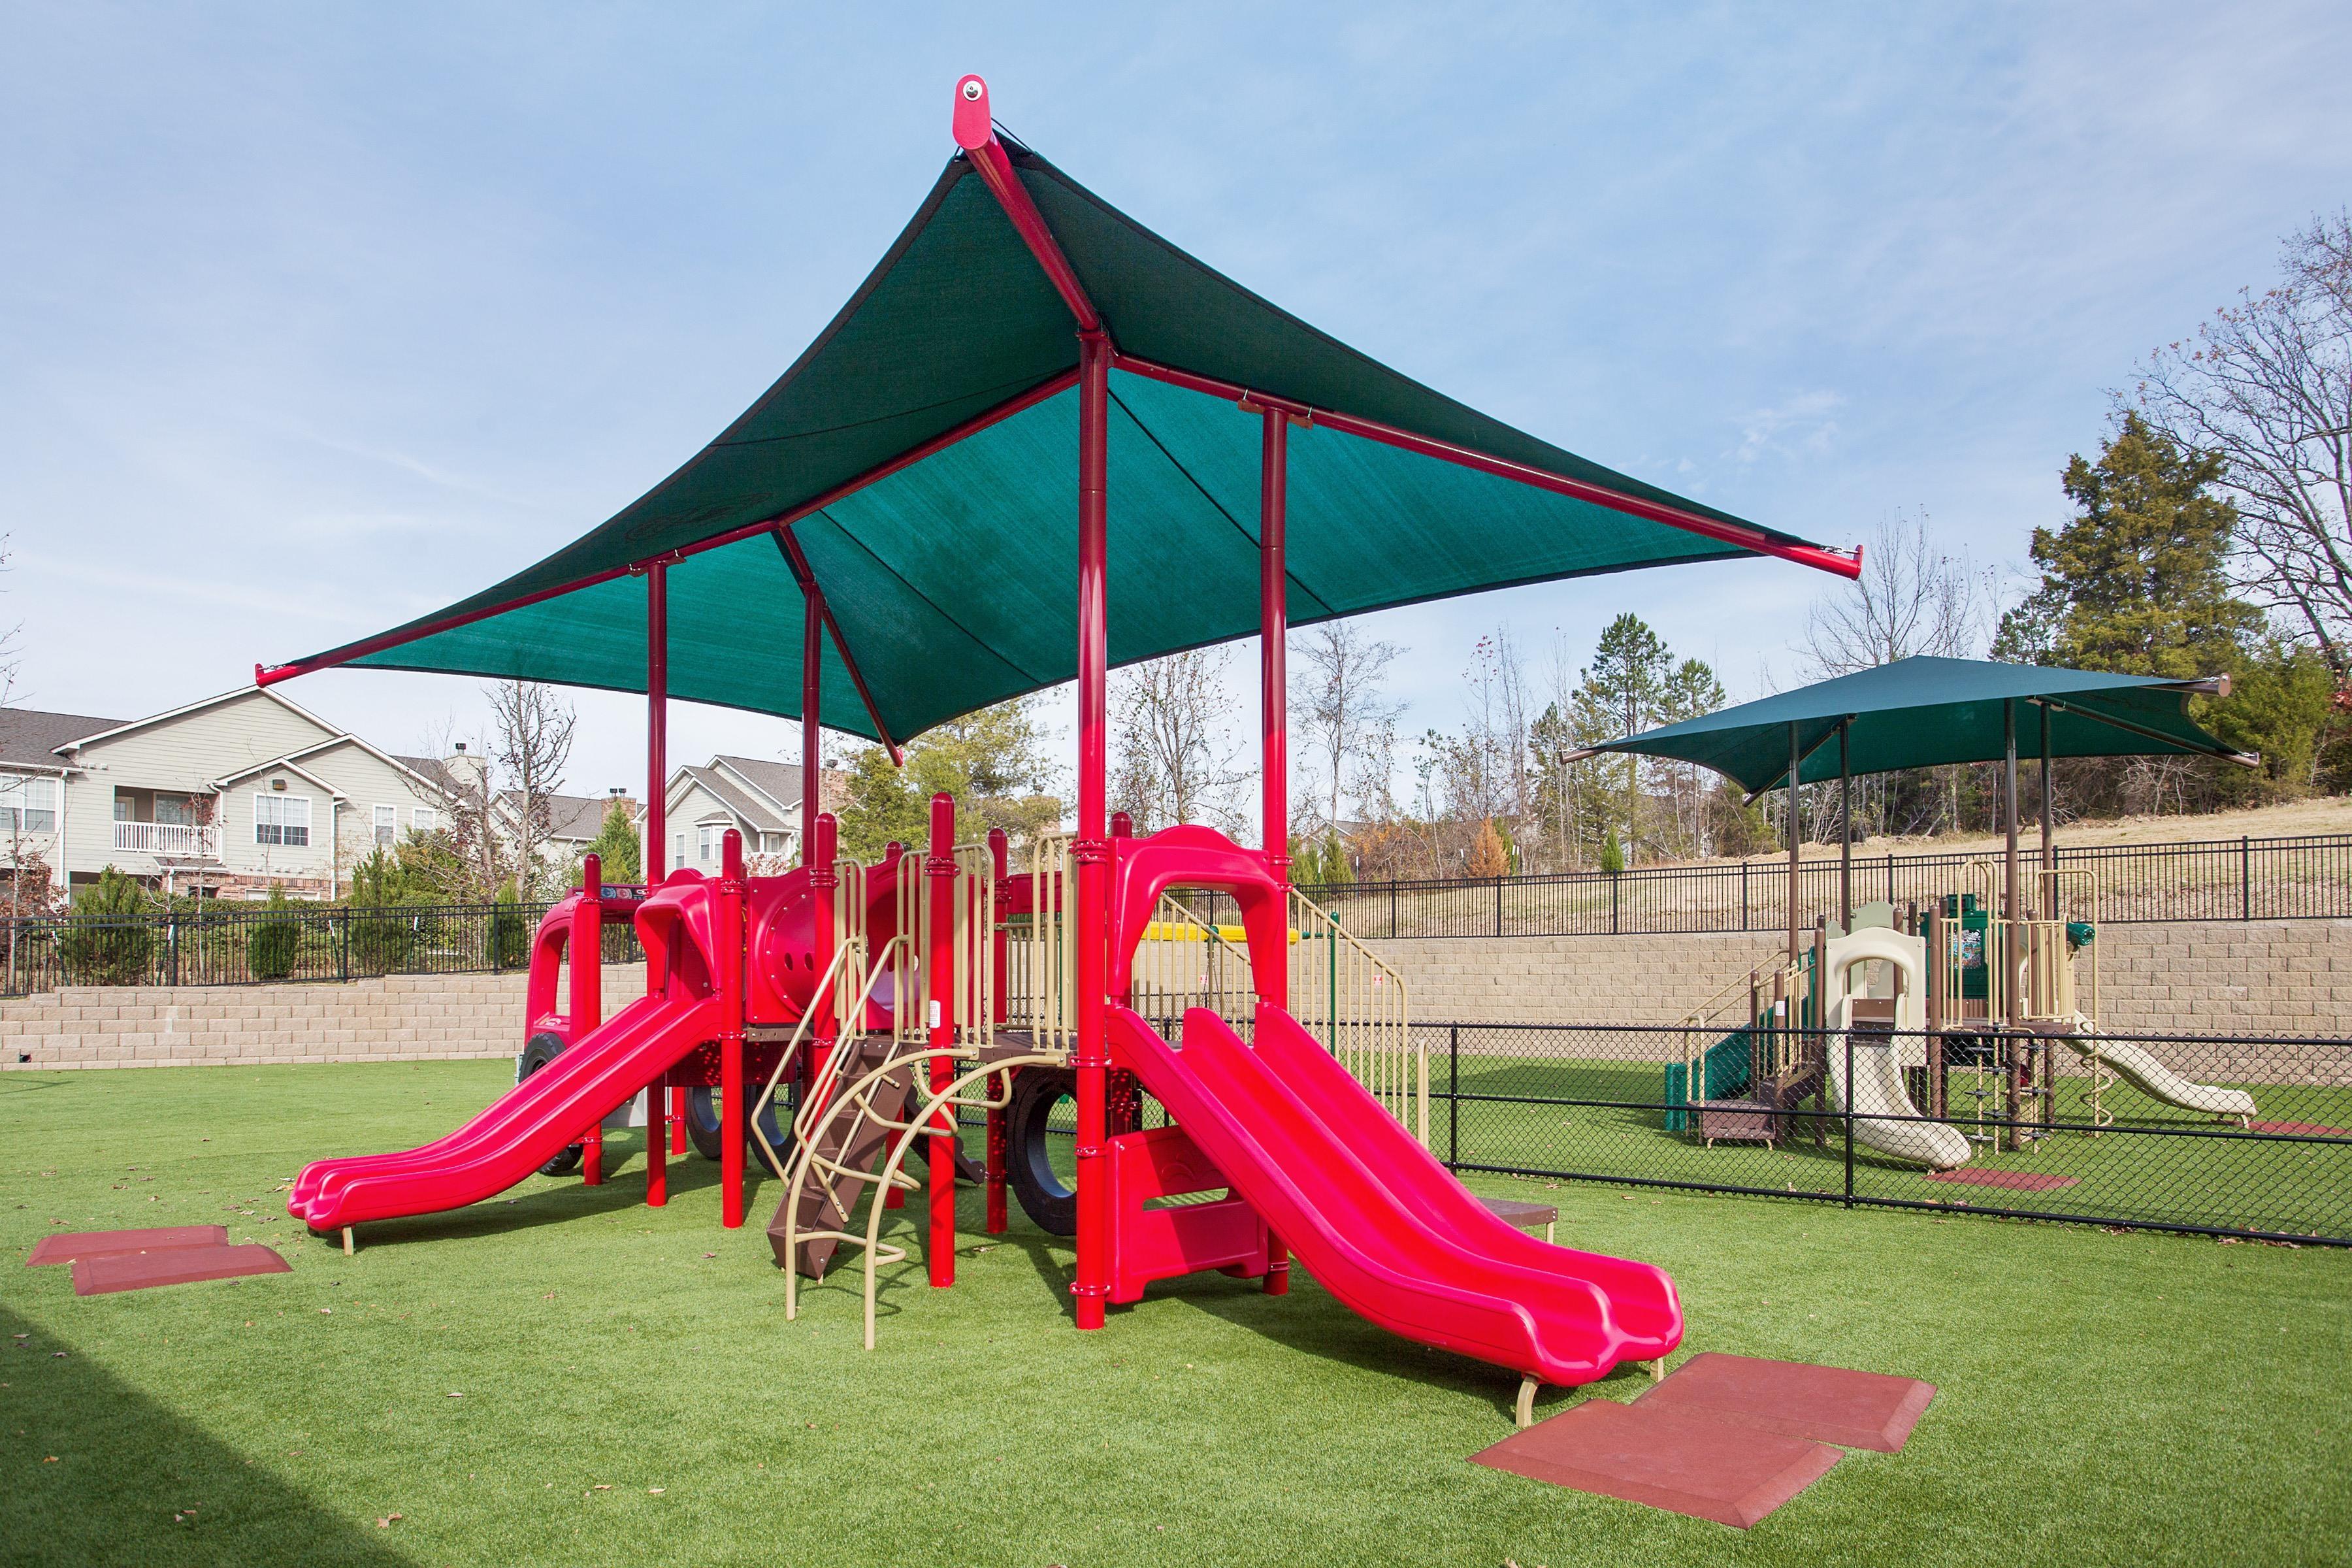 Primrose School of West Little Rock image 2